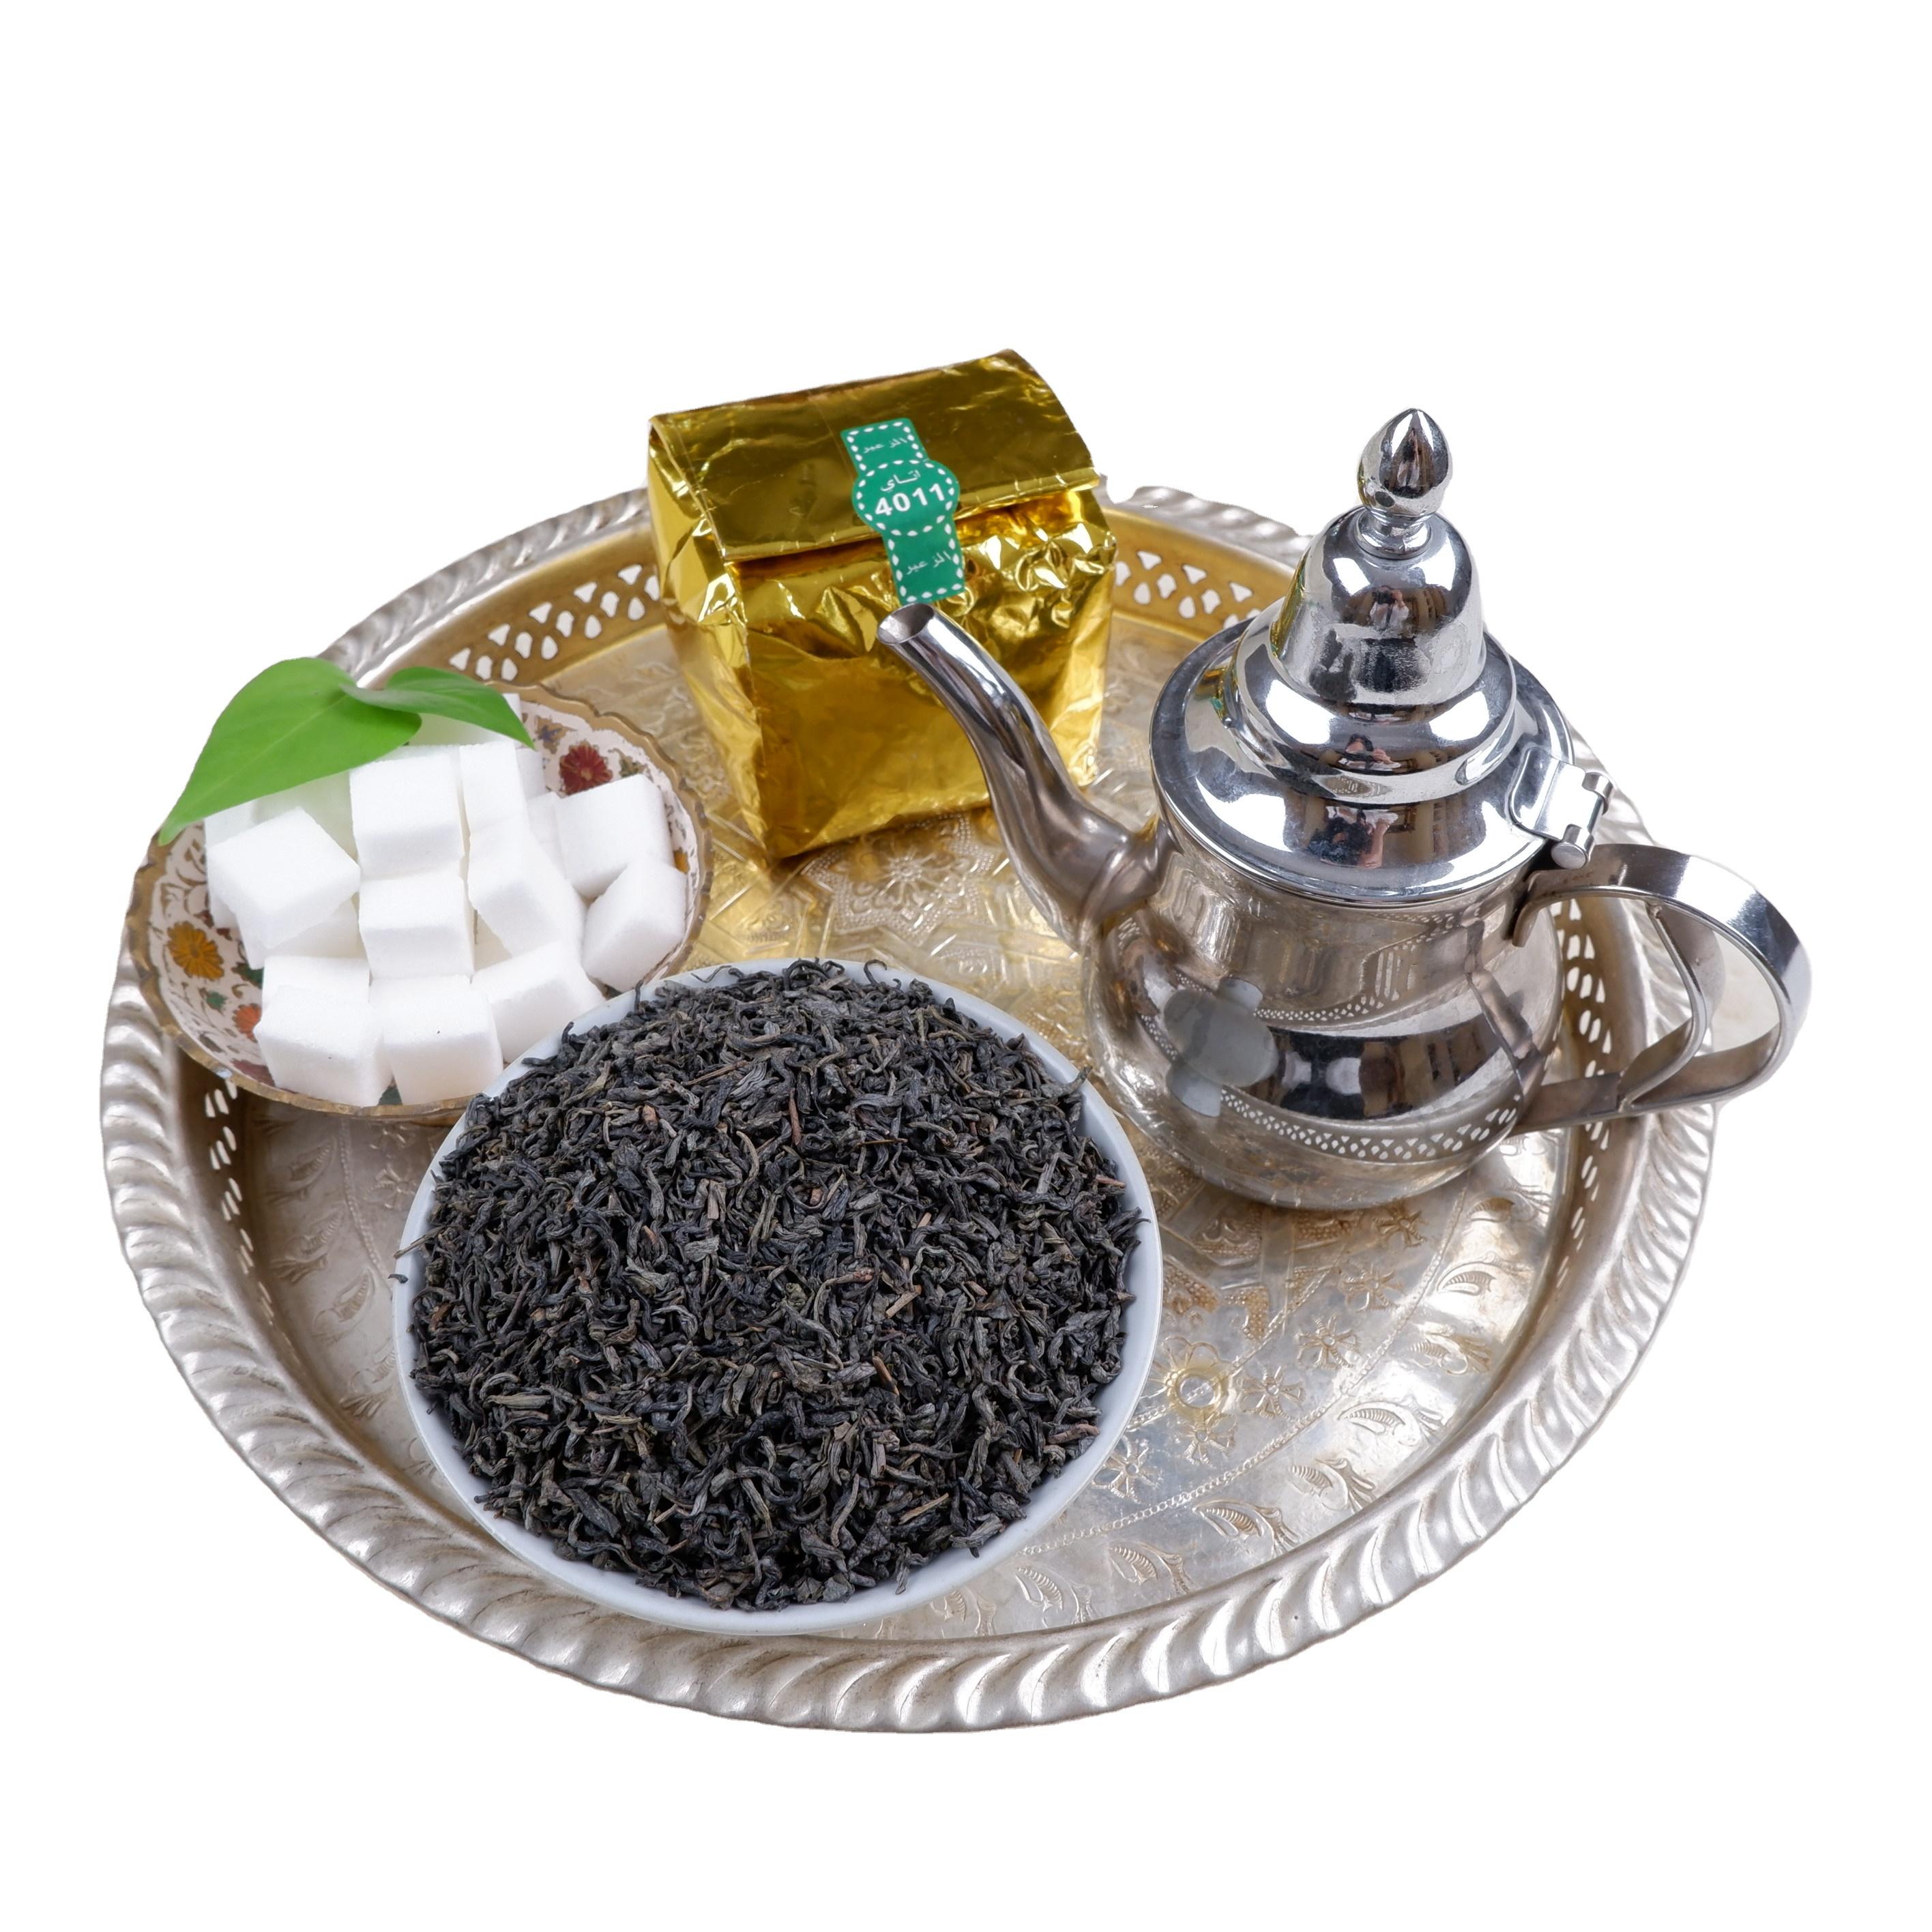 4011AAAA Good Price Factory Wholesale Chunmee Chinese Green Tea - 4uTea | 4uTea.com